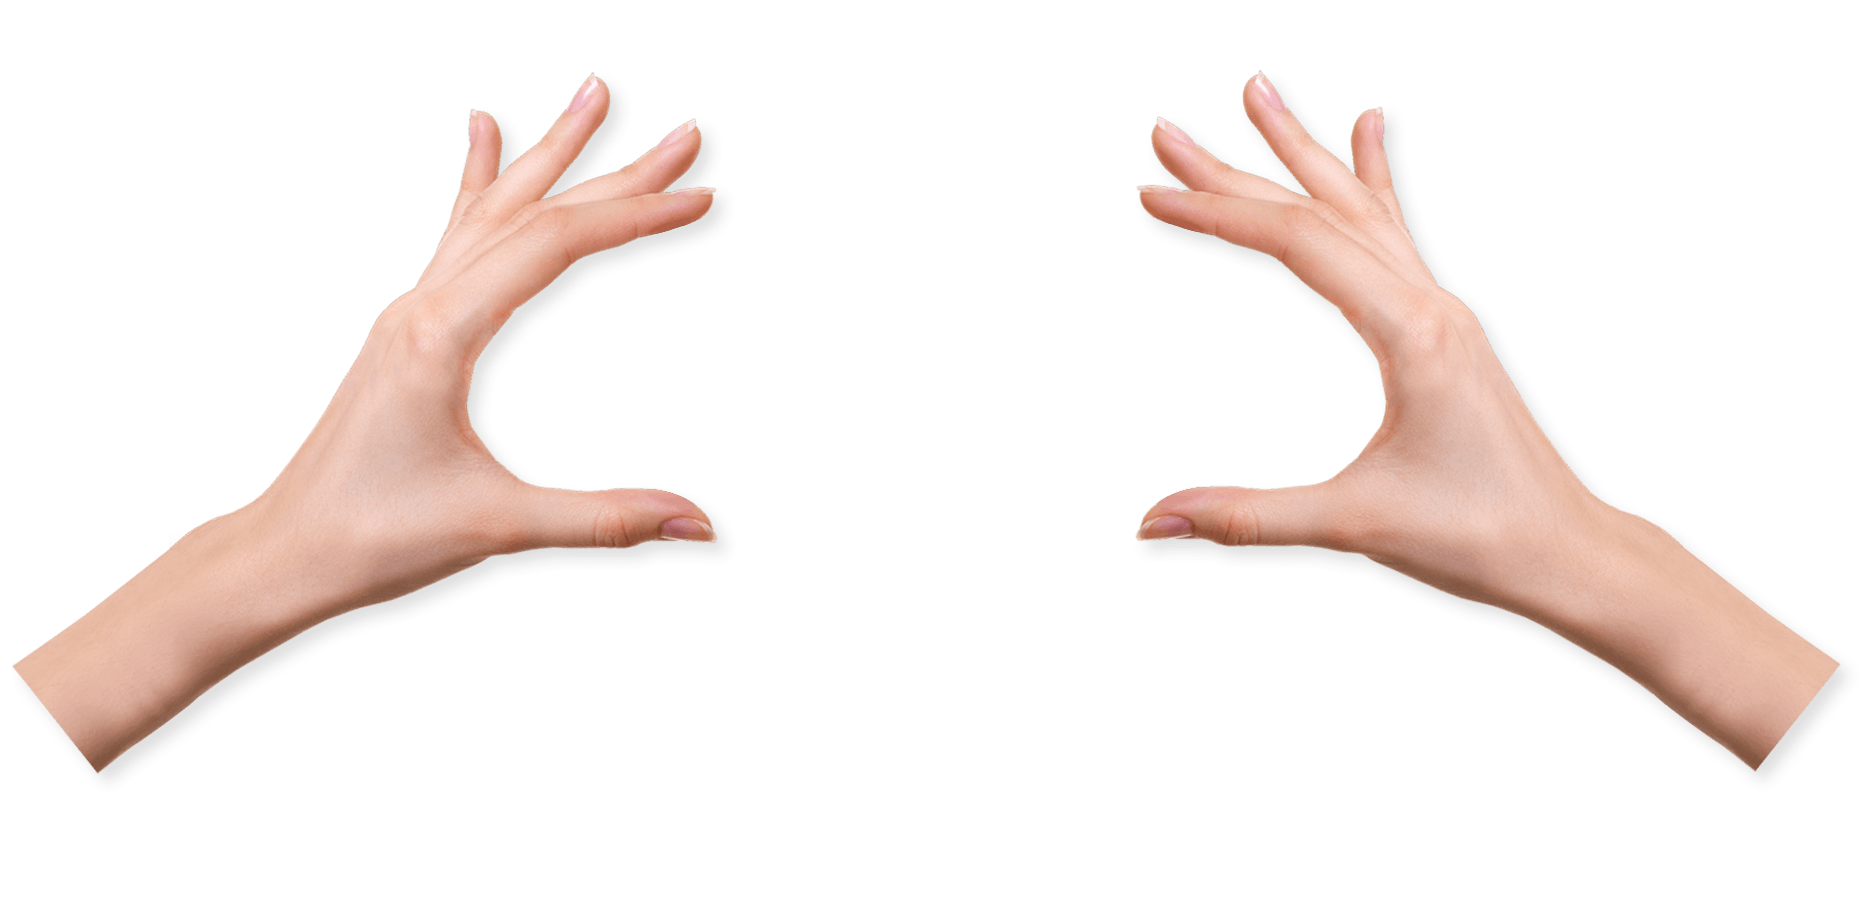 Skin clipart big hand. Nails png image purepng